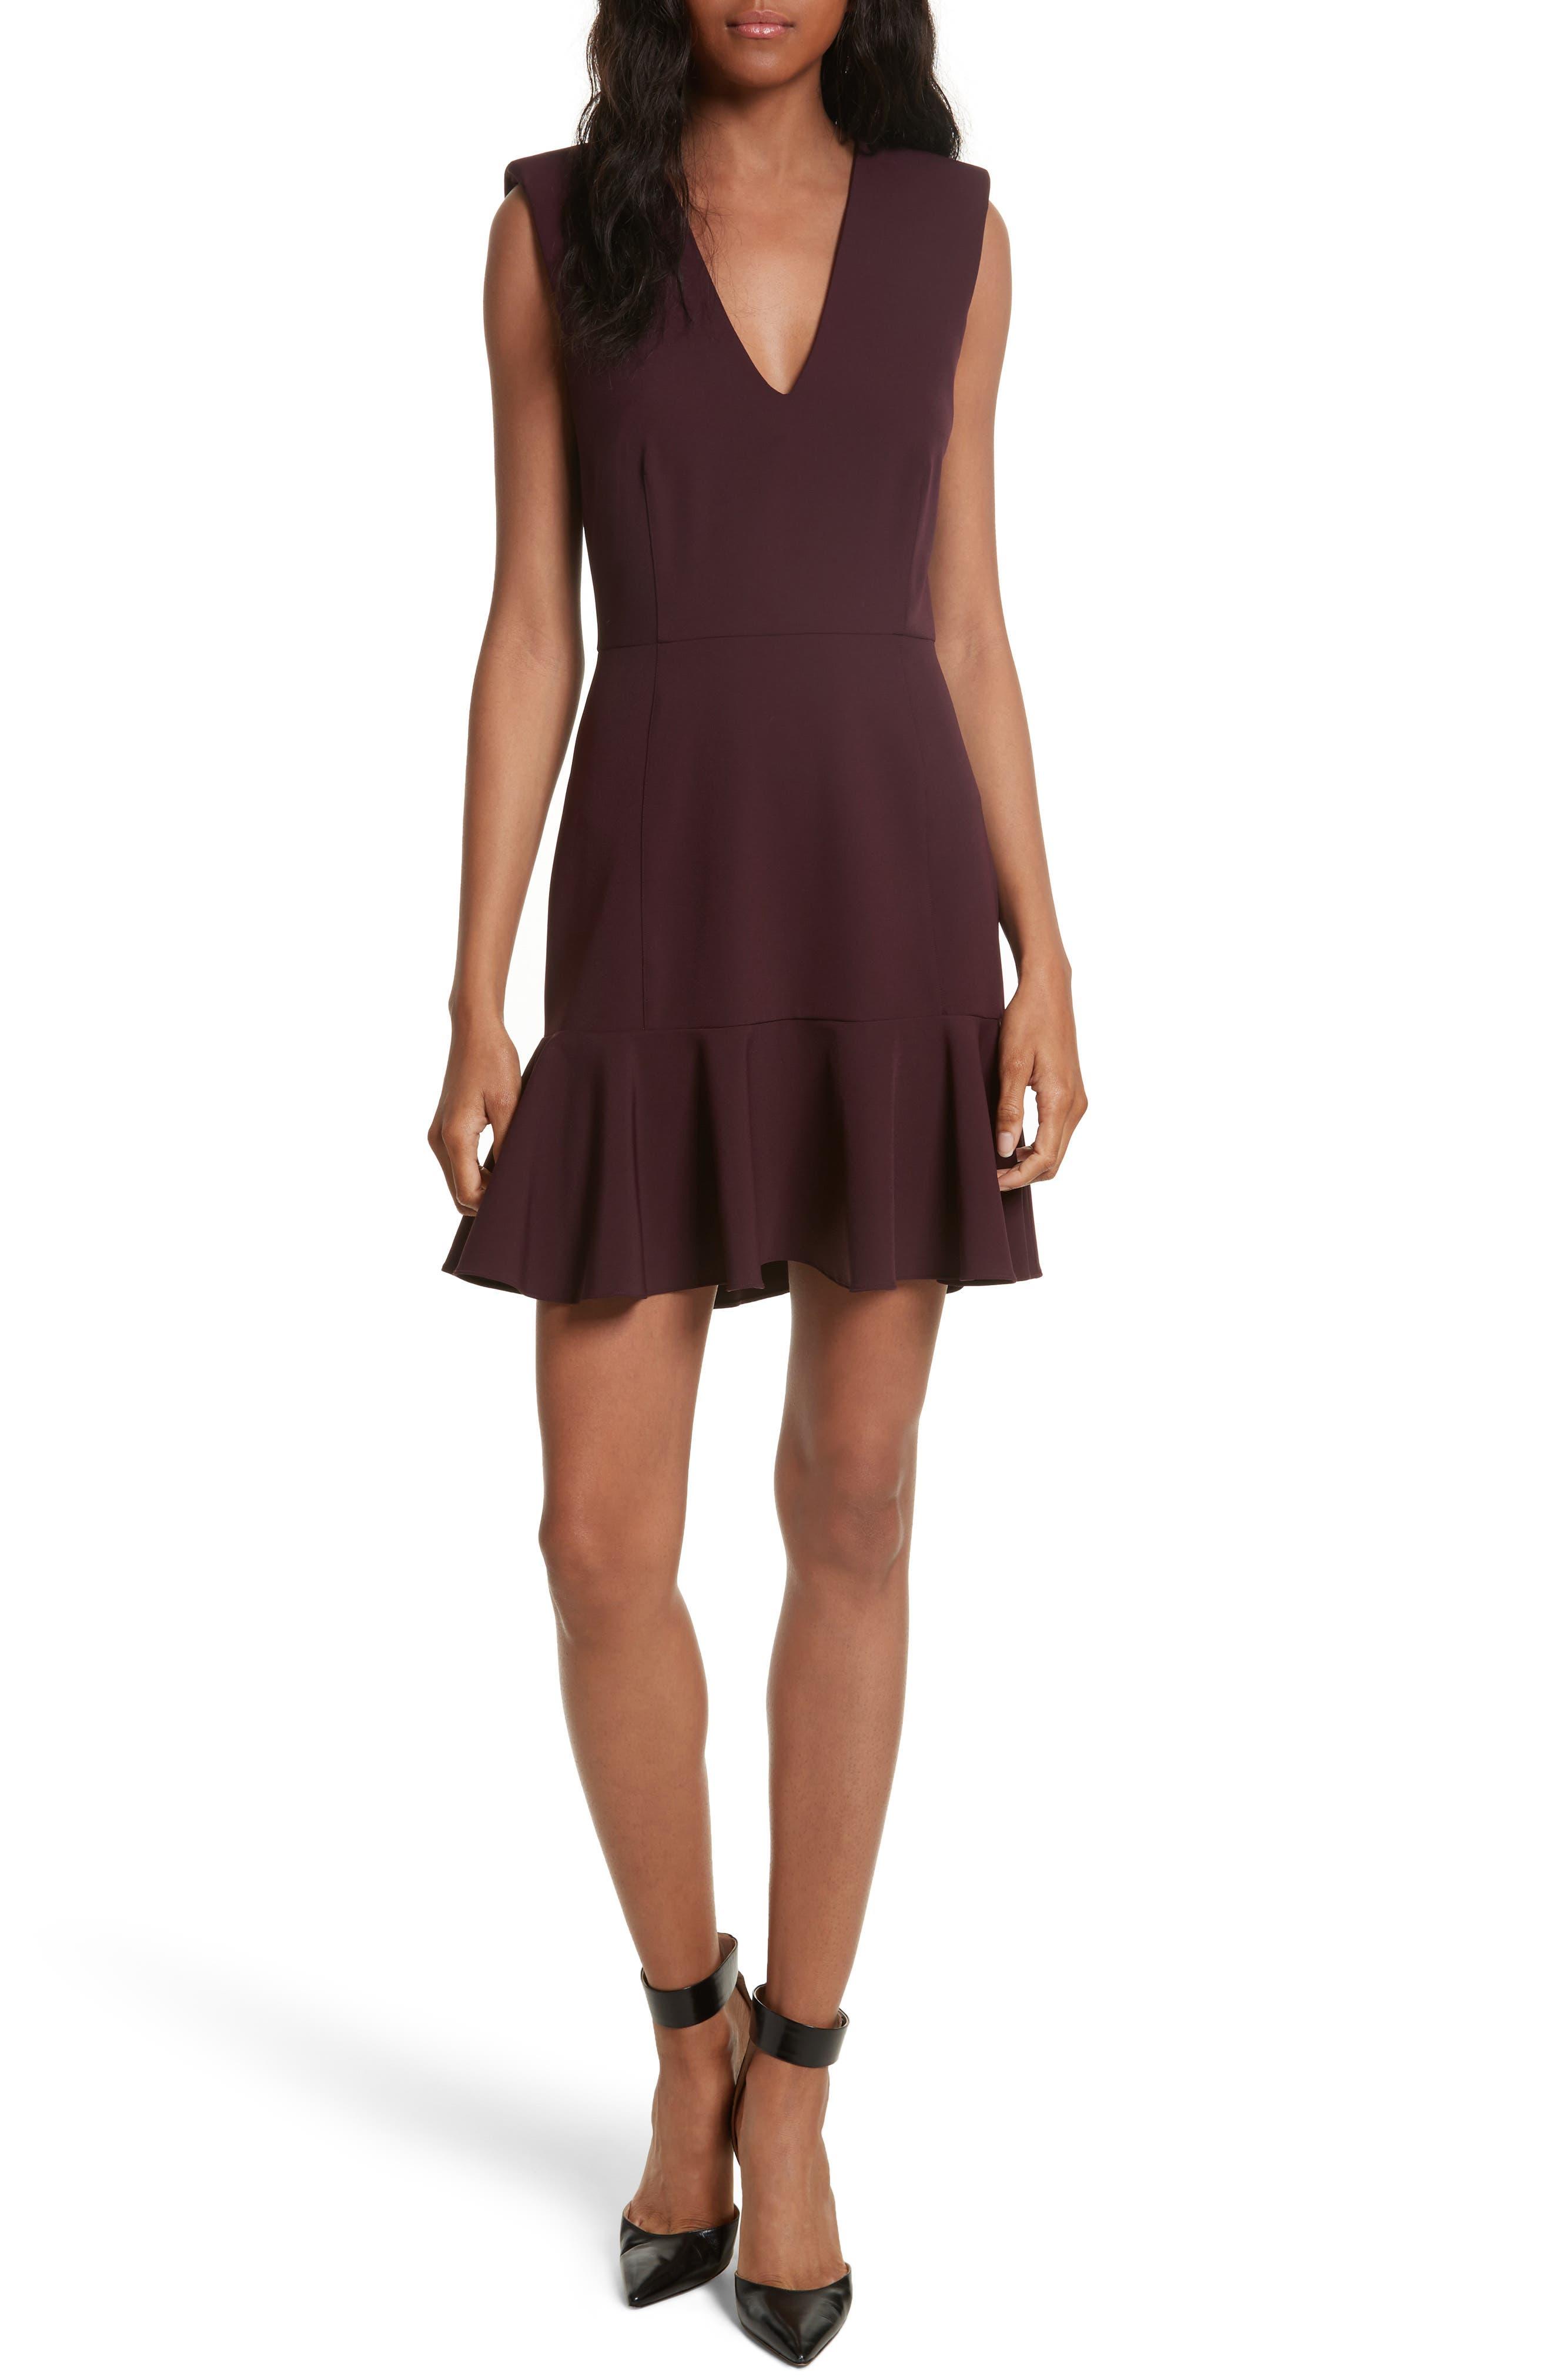 VERONICA BEARD Scarlet Flounce Dress